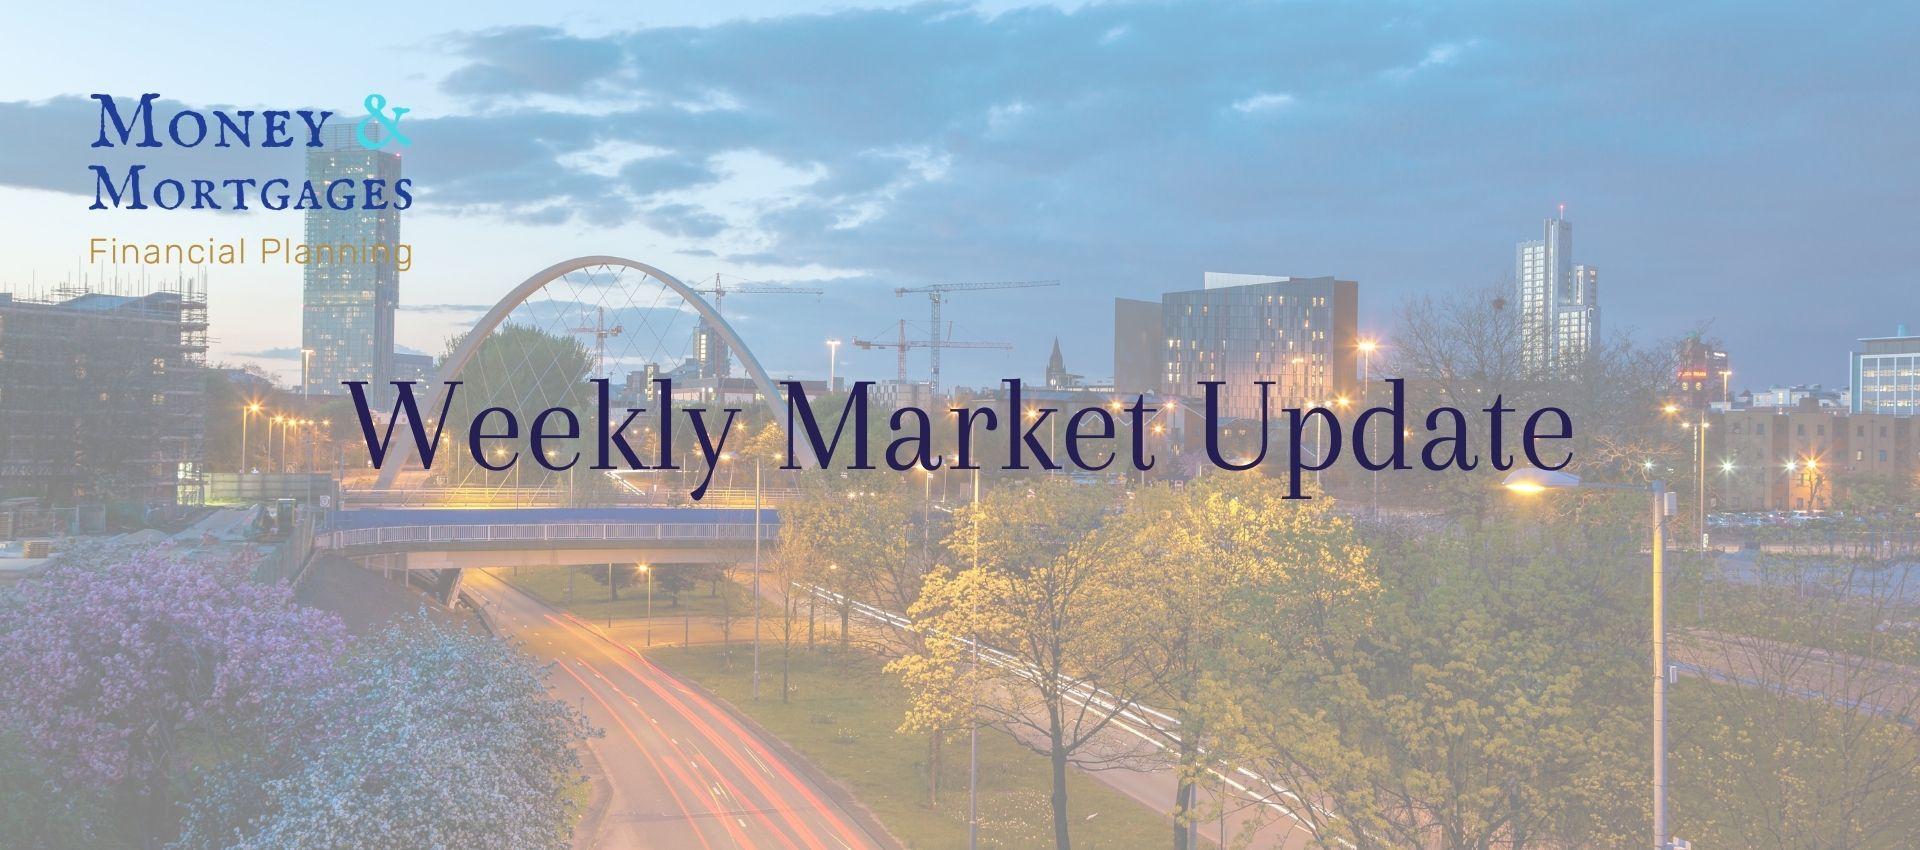 market update to 23 April